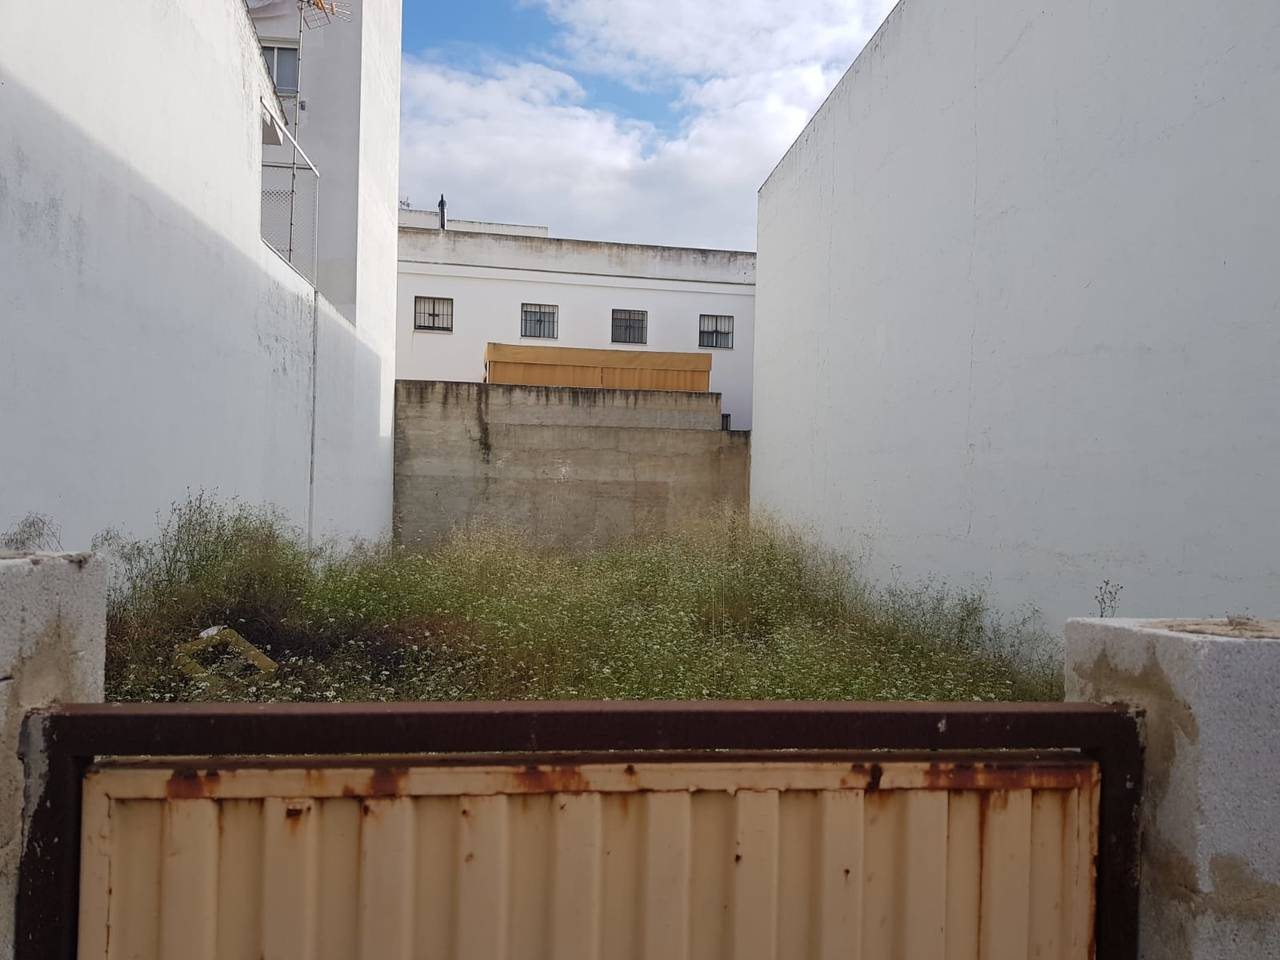 Venta solar en Huelva.  - Foto 3